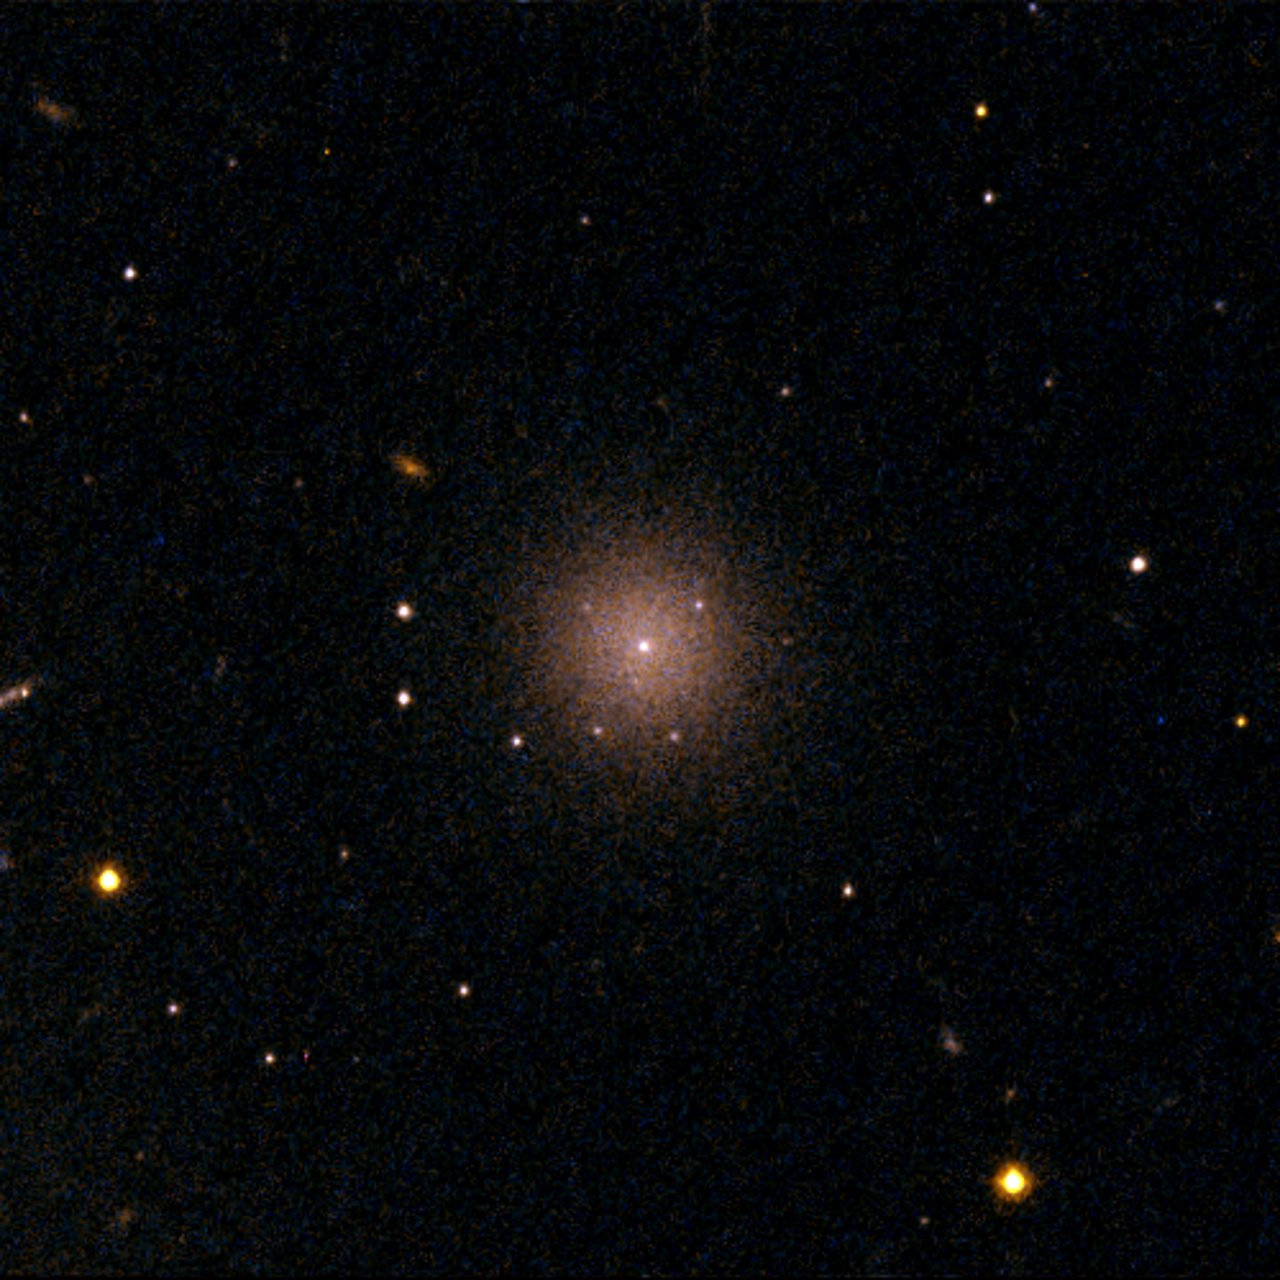 Perseus Dwarf Galaxy [CGW2003] J031900.4+4129